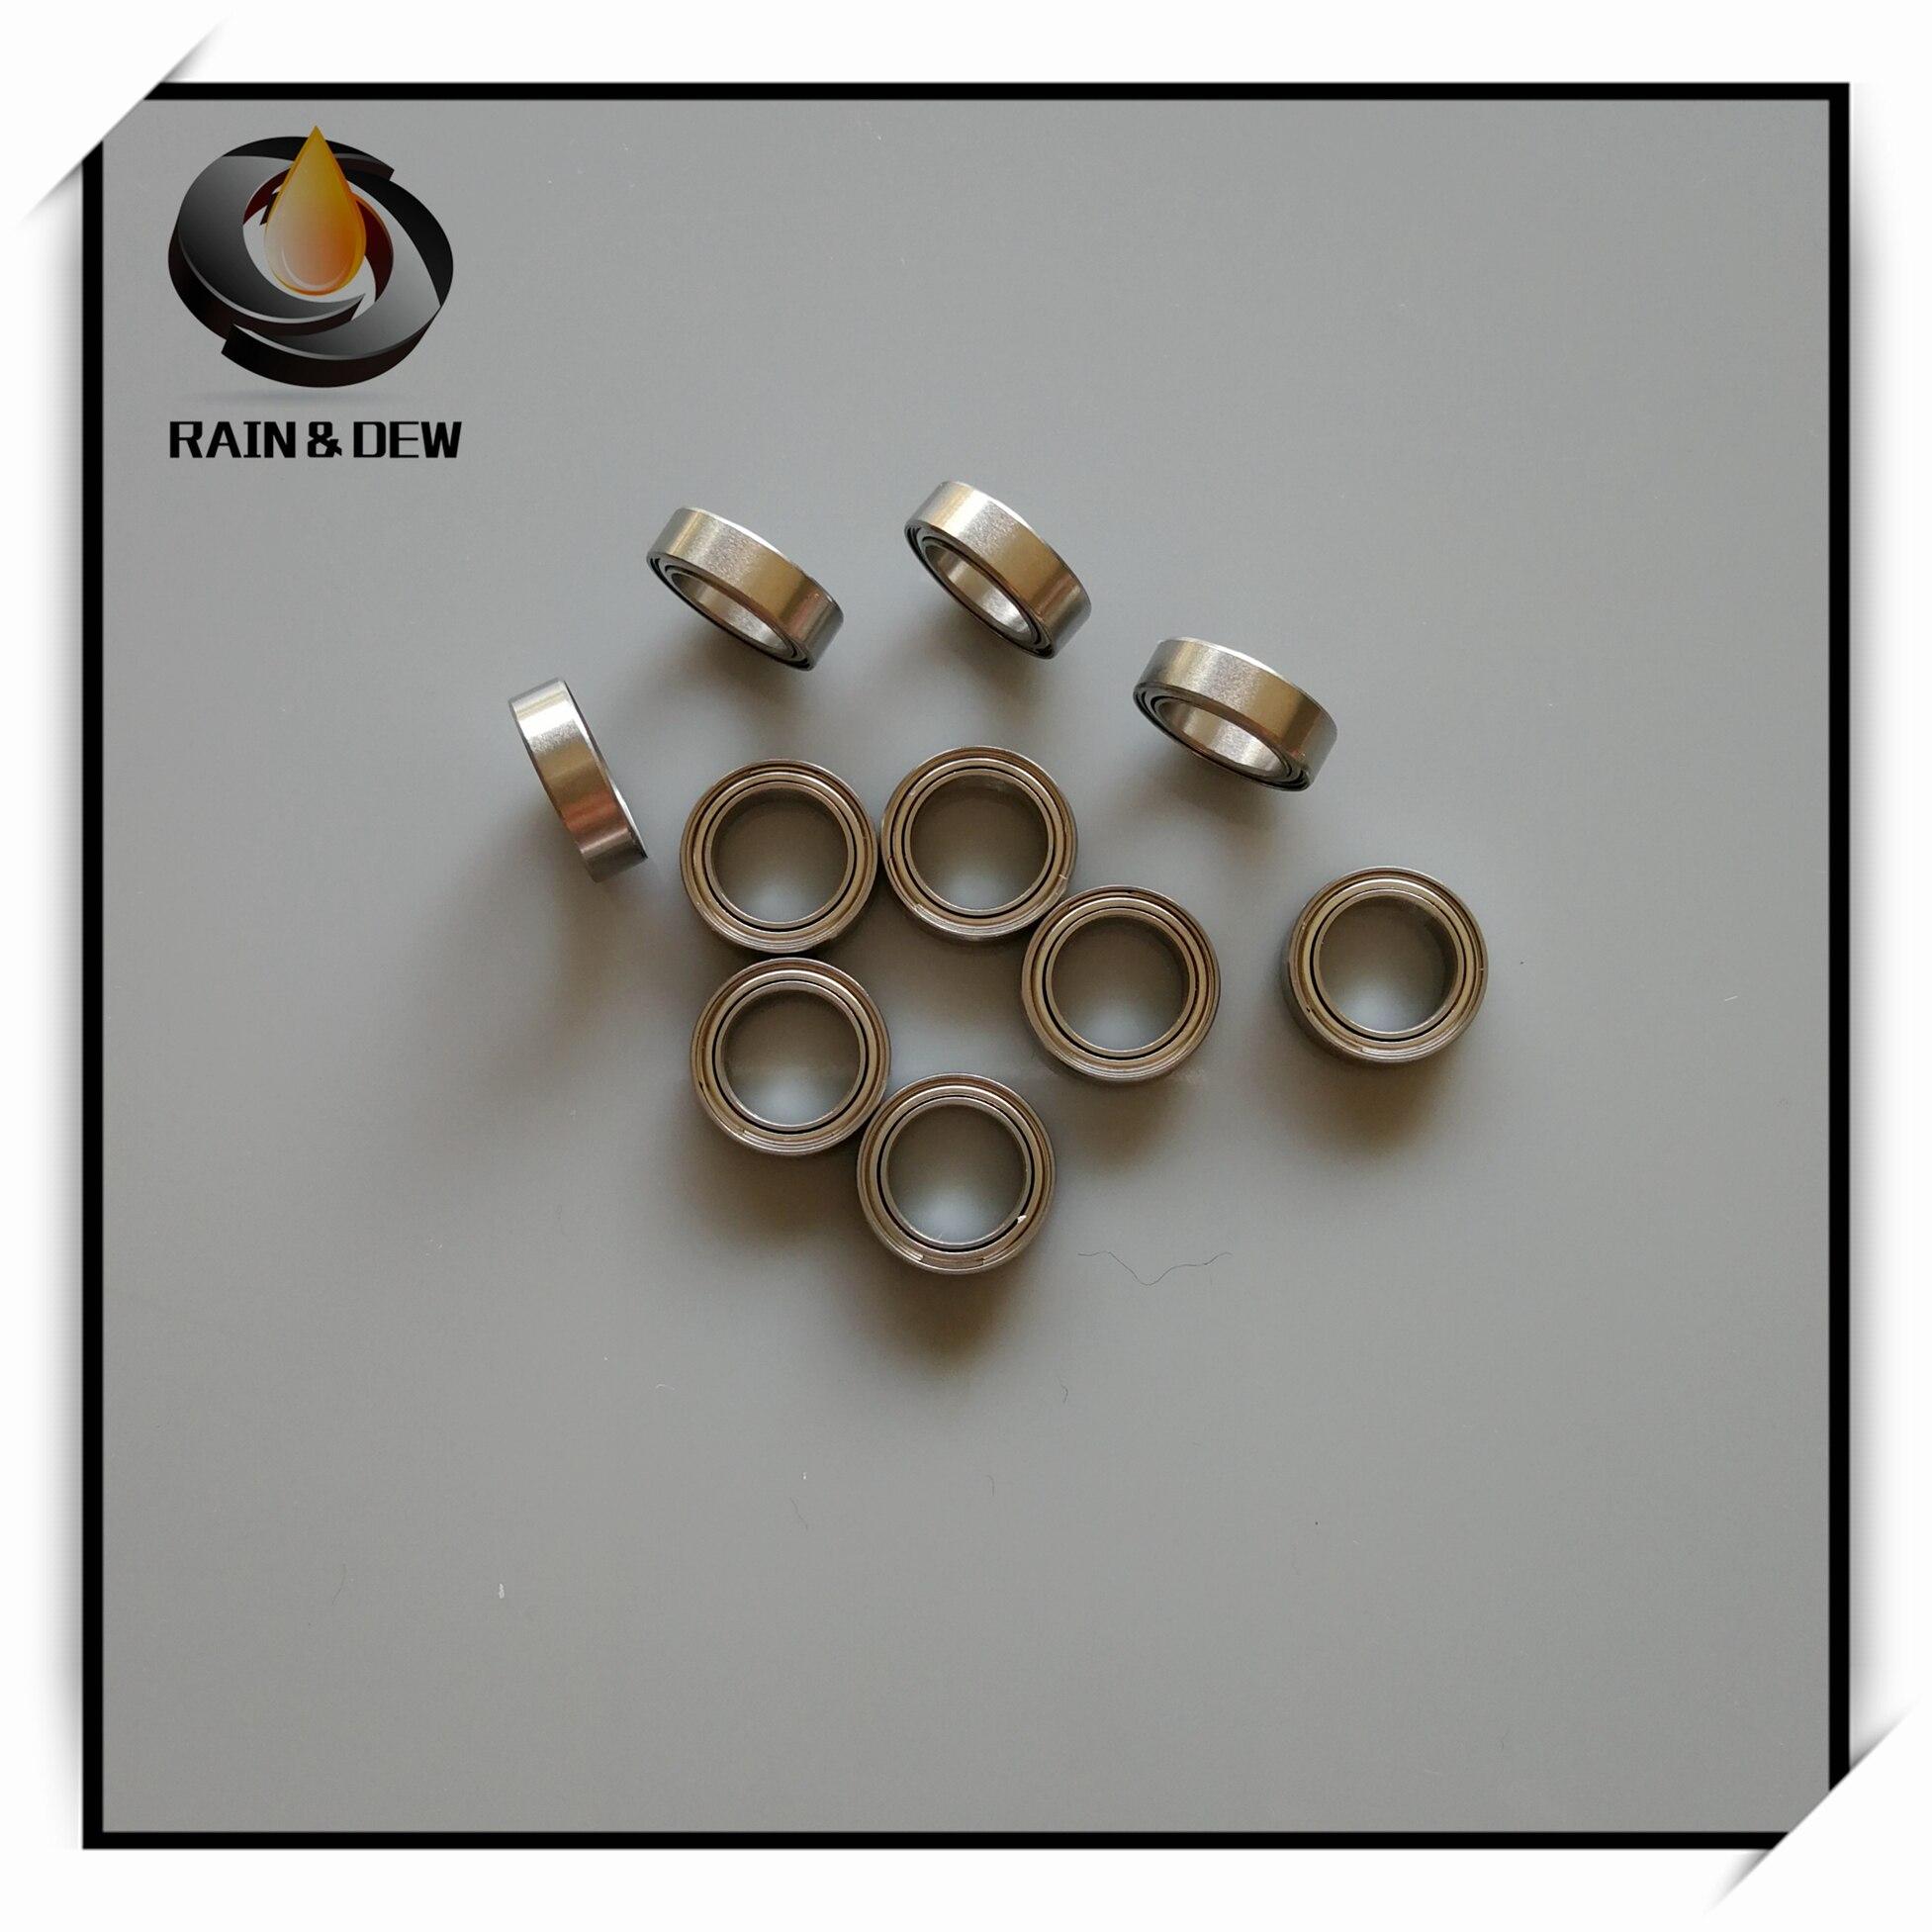 1Pcs  SMR117ZZ CB ABEC7 7X11X3 Mm MR117 Stainless Steel Hybrid Ceramic Ball Bearing